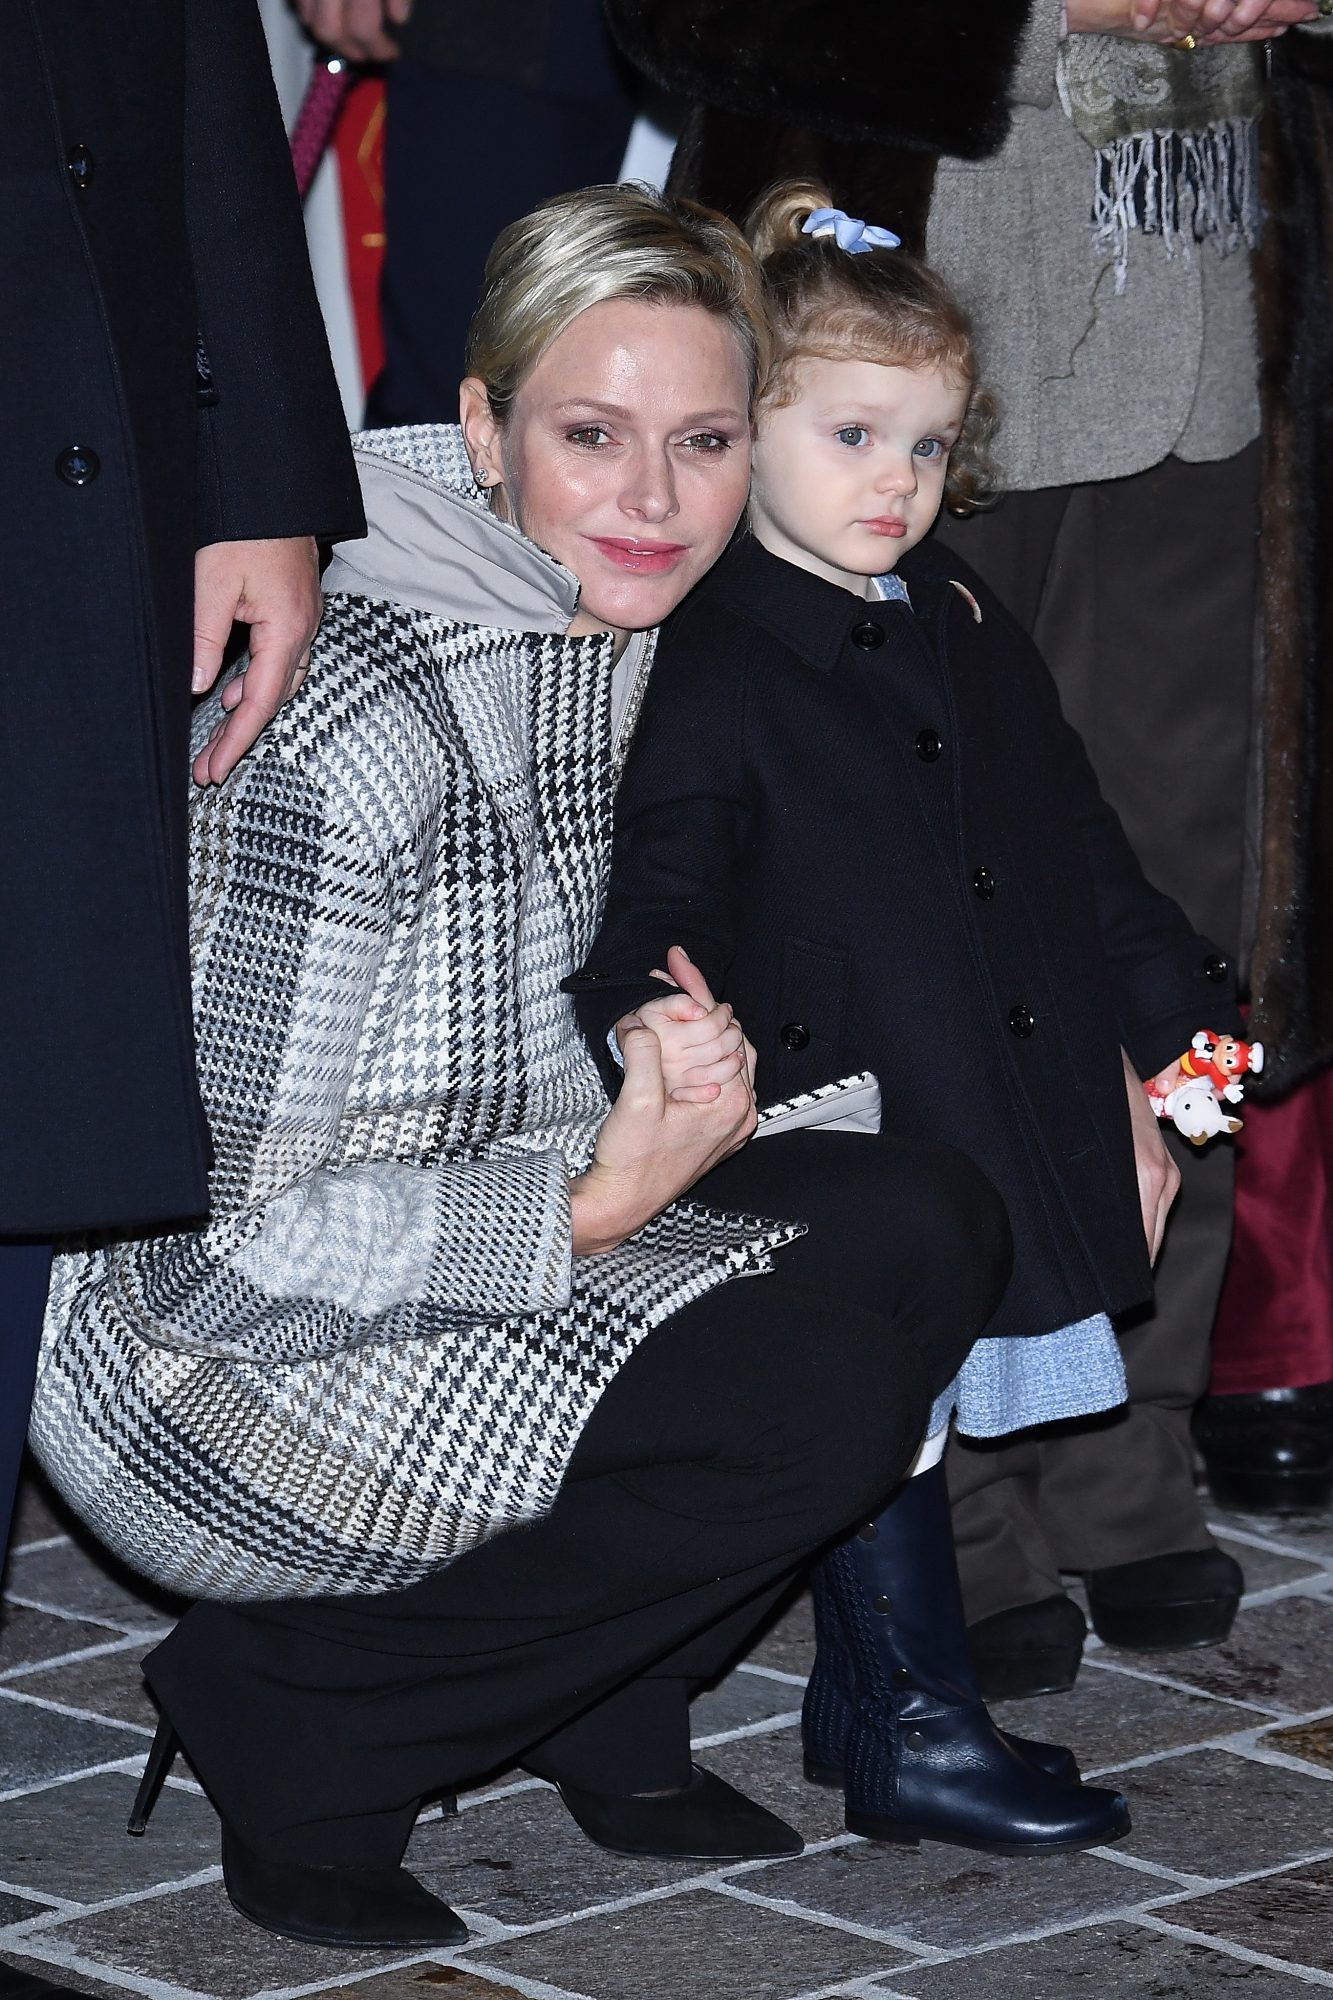 Pirncesa Charlene Princesa Gabriella de Monaco